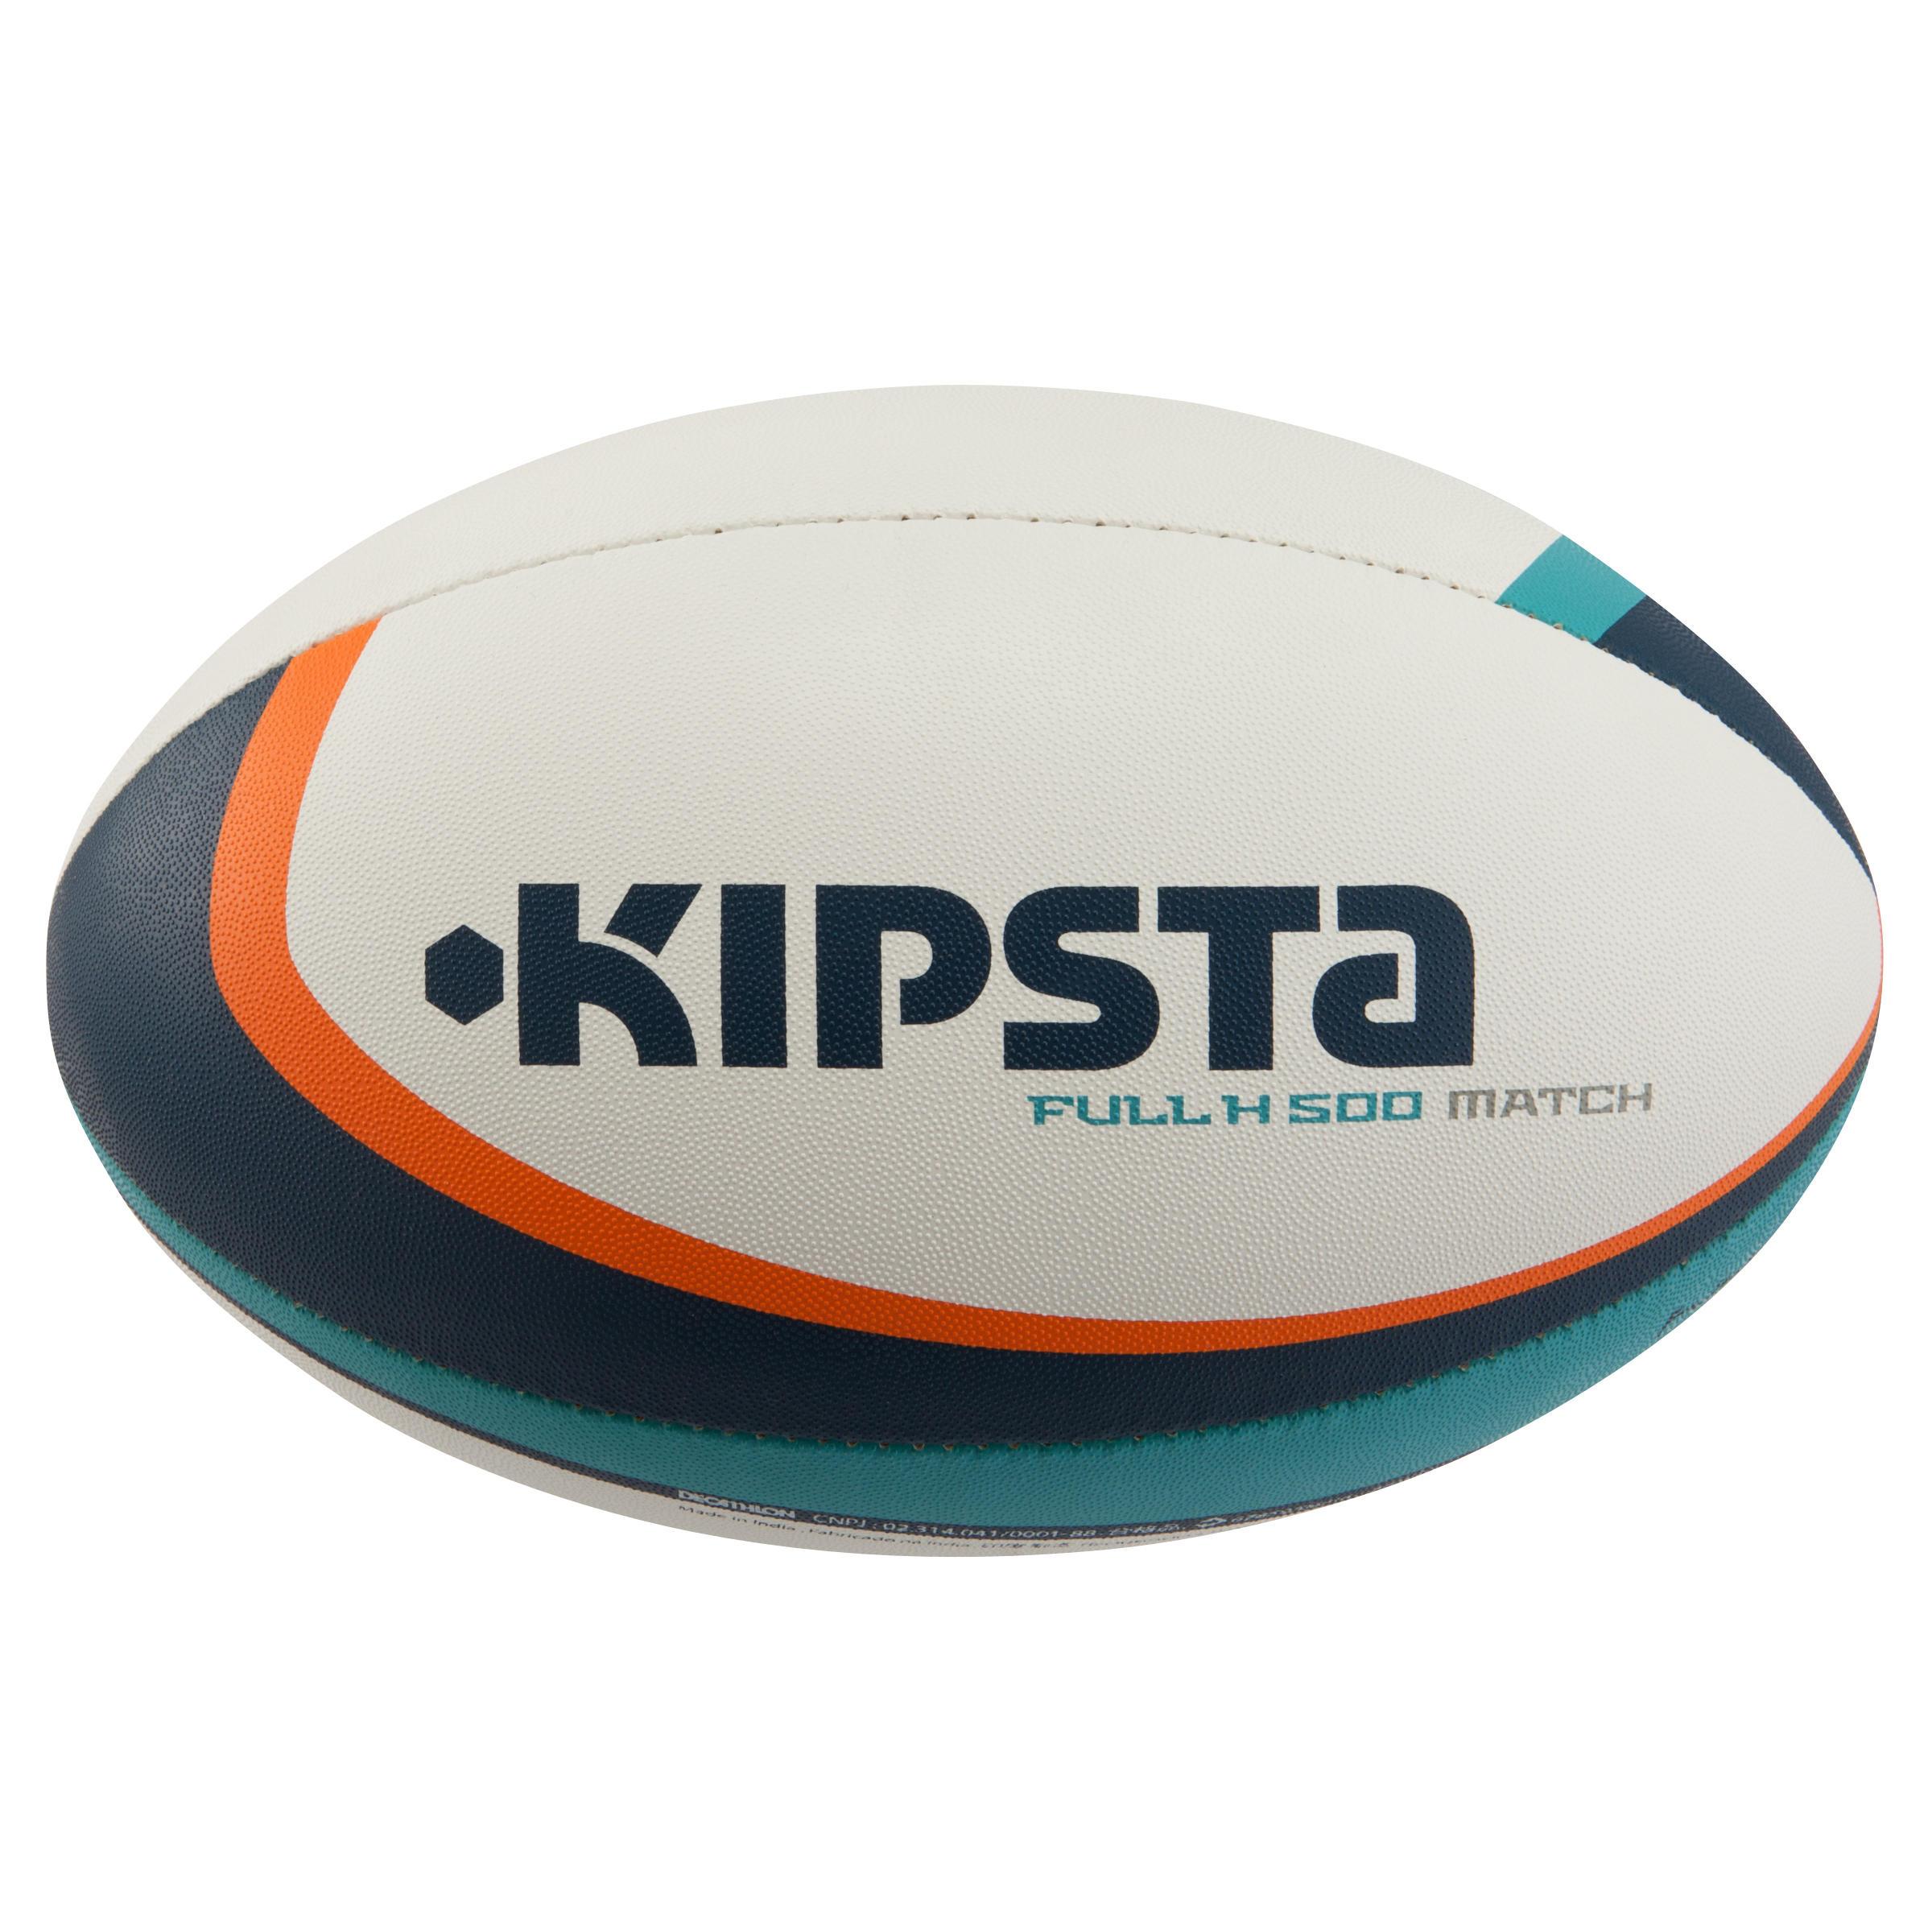 Kipsta Rugbybal Full H 500 maat 5